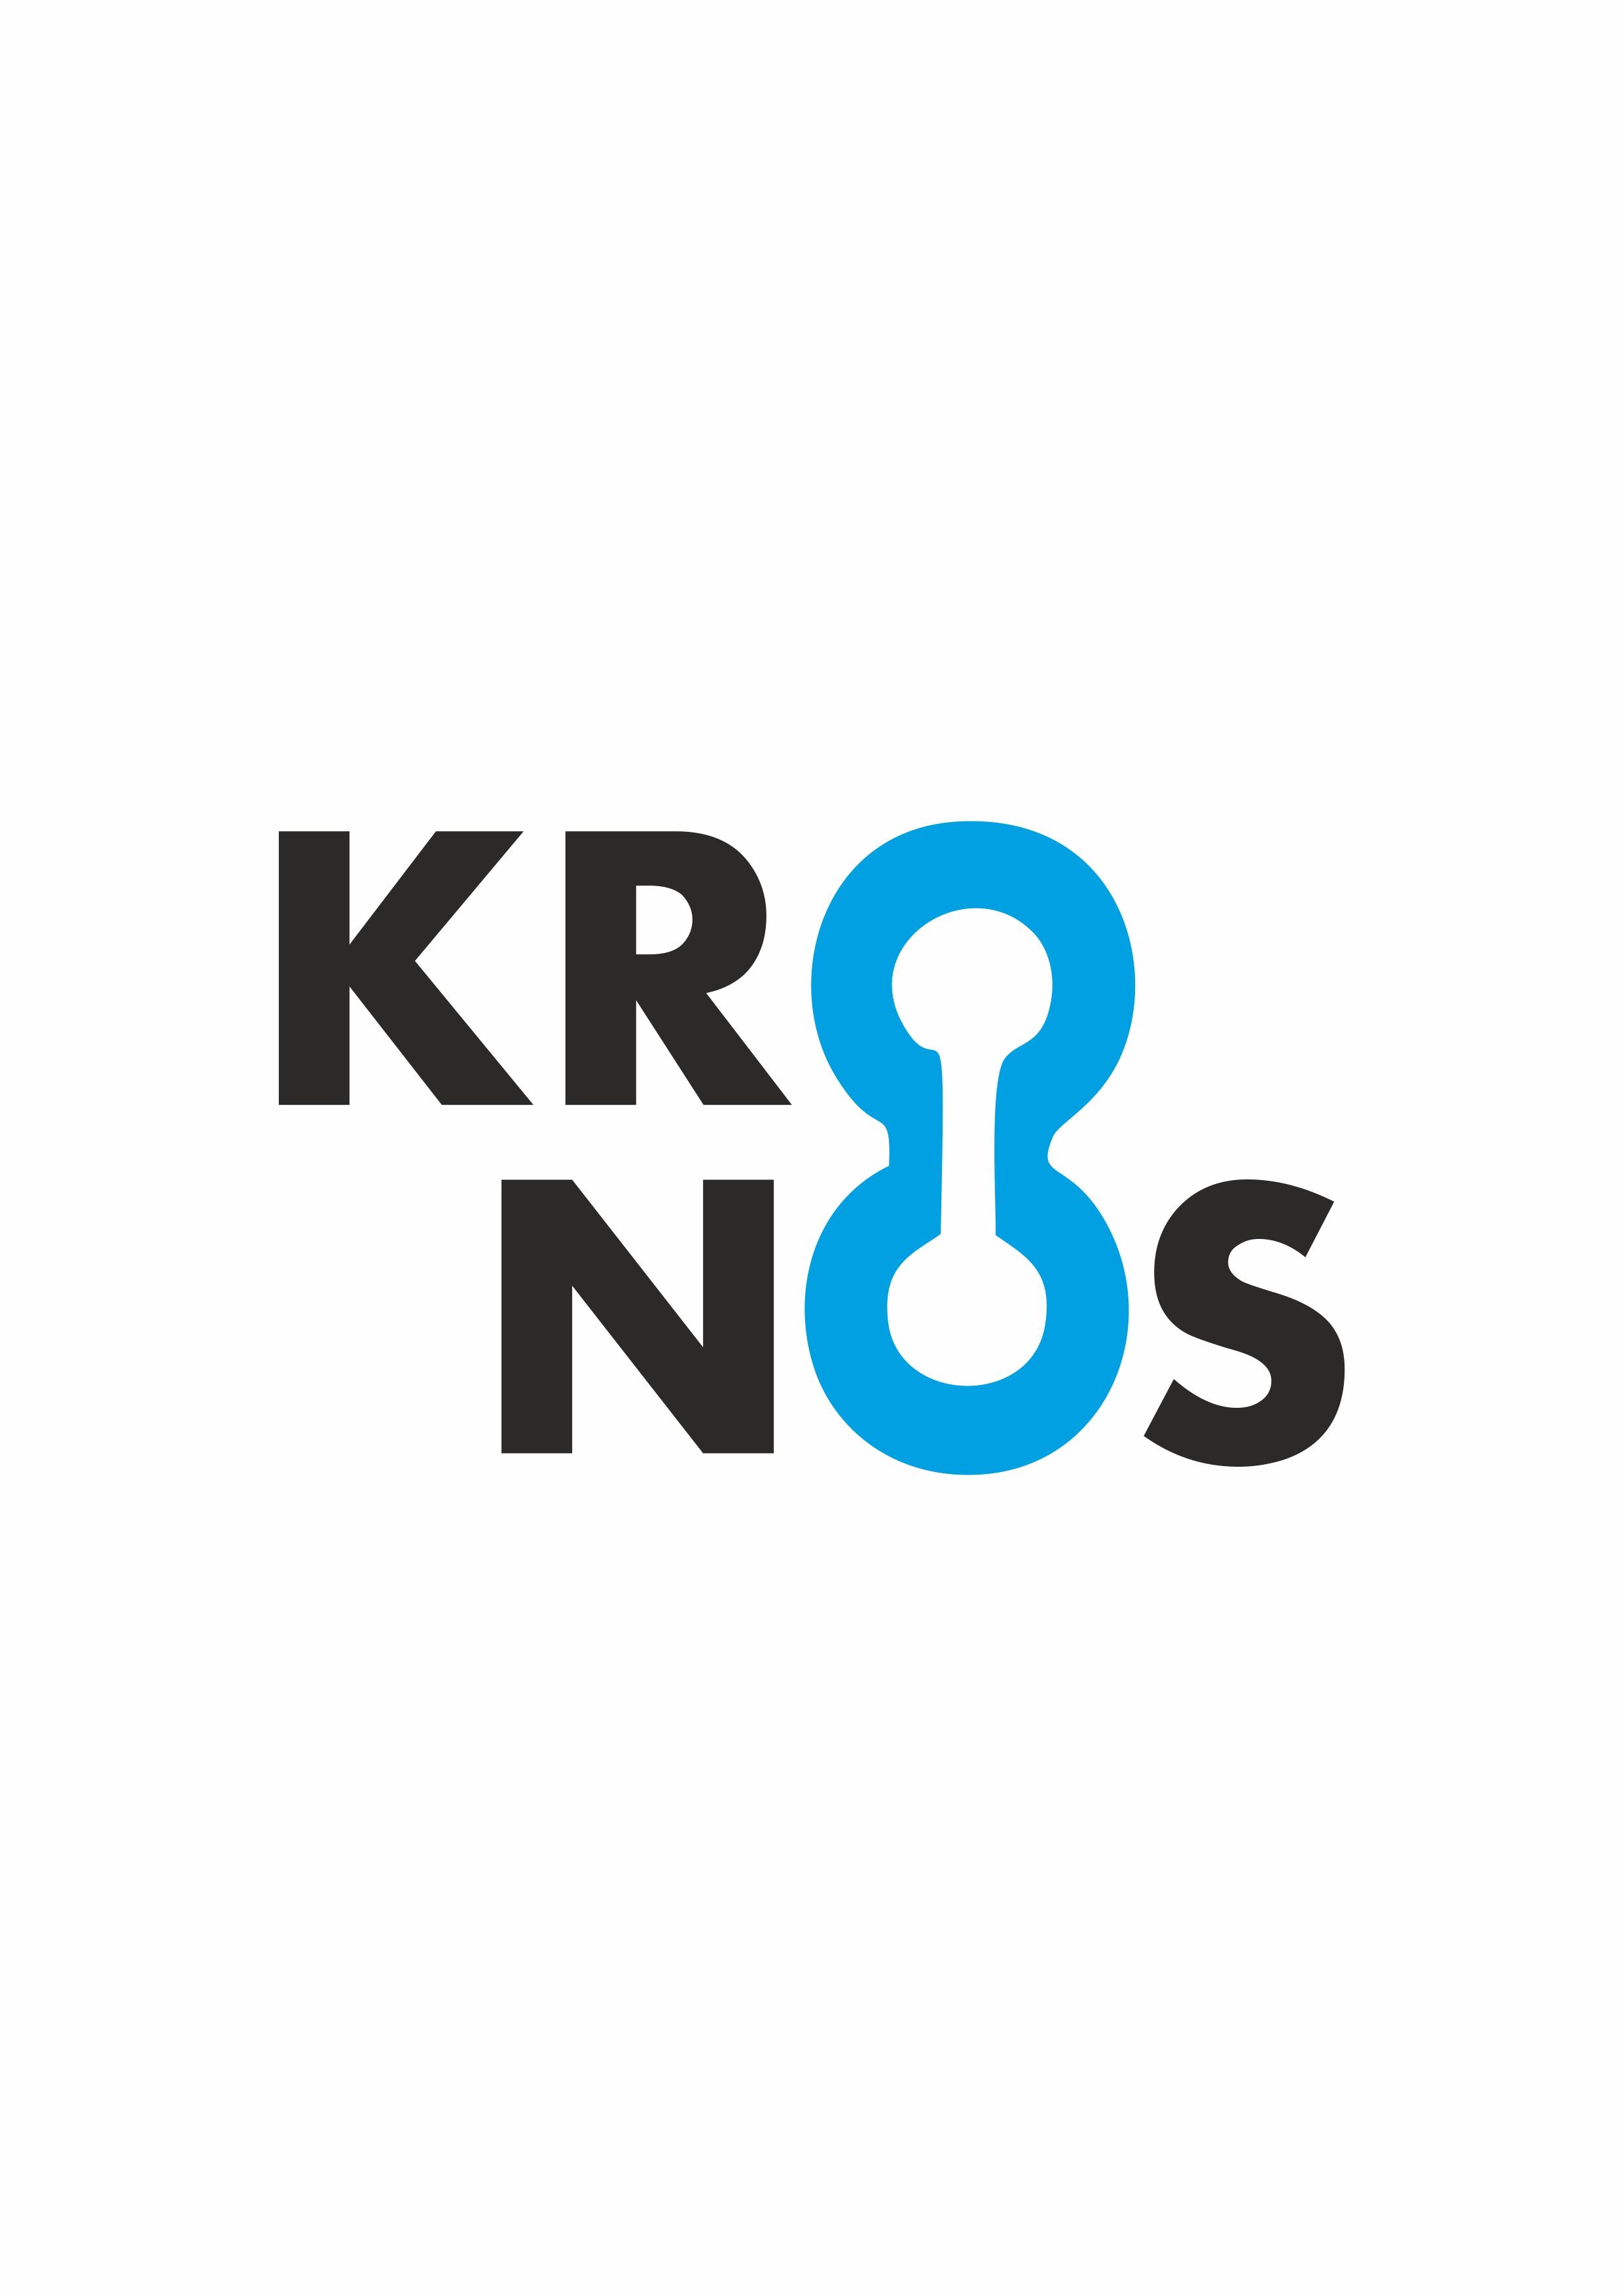 Разработать логотип KRONOS фото f_4785fb09bf0c6ef4.jpg